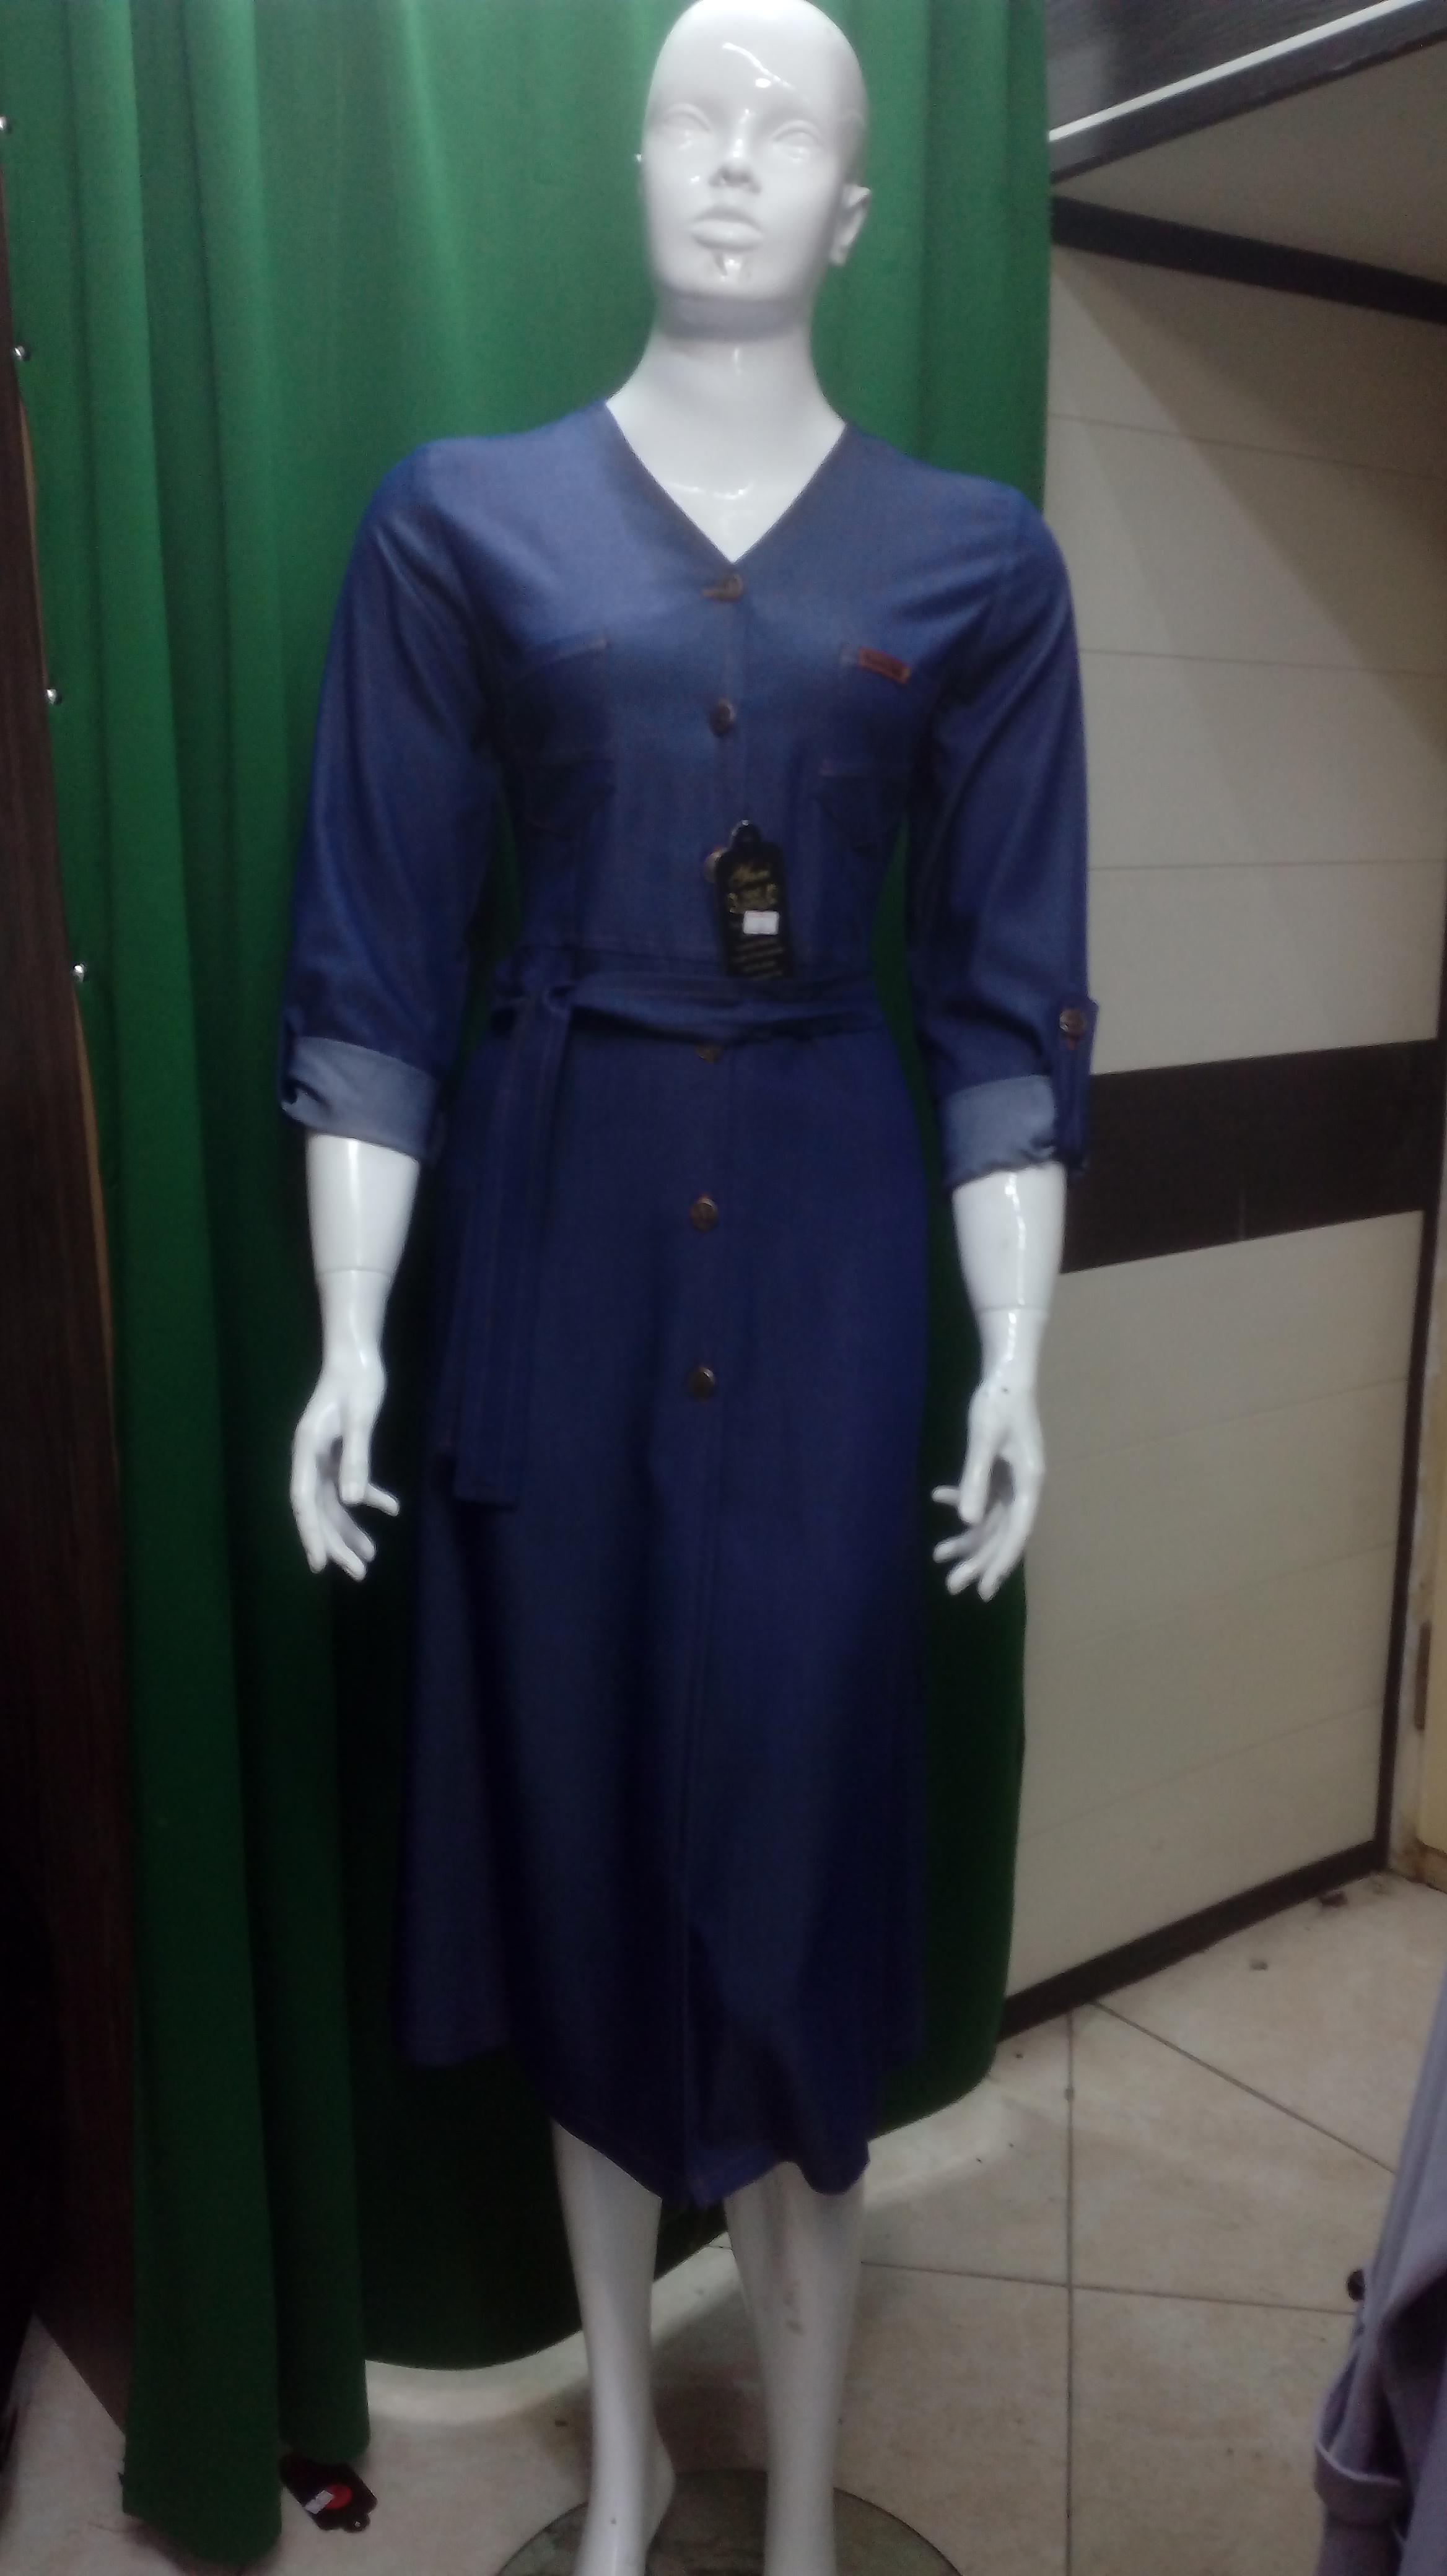 مانتو طرح لی یقه 7 زنانه بلند رنگ آبی تیره کد 74